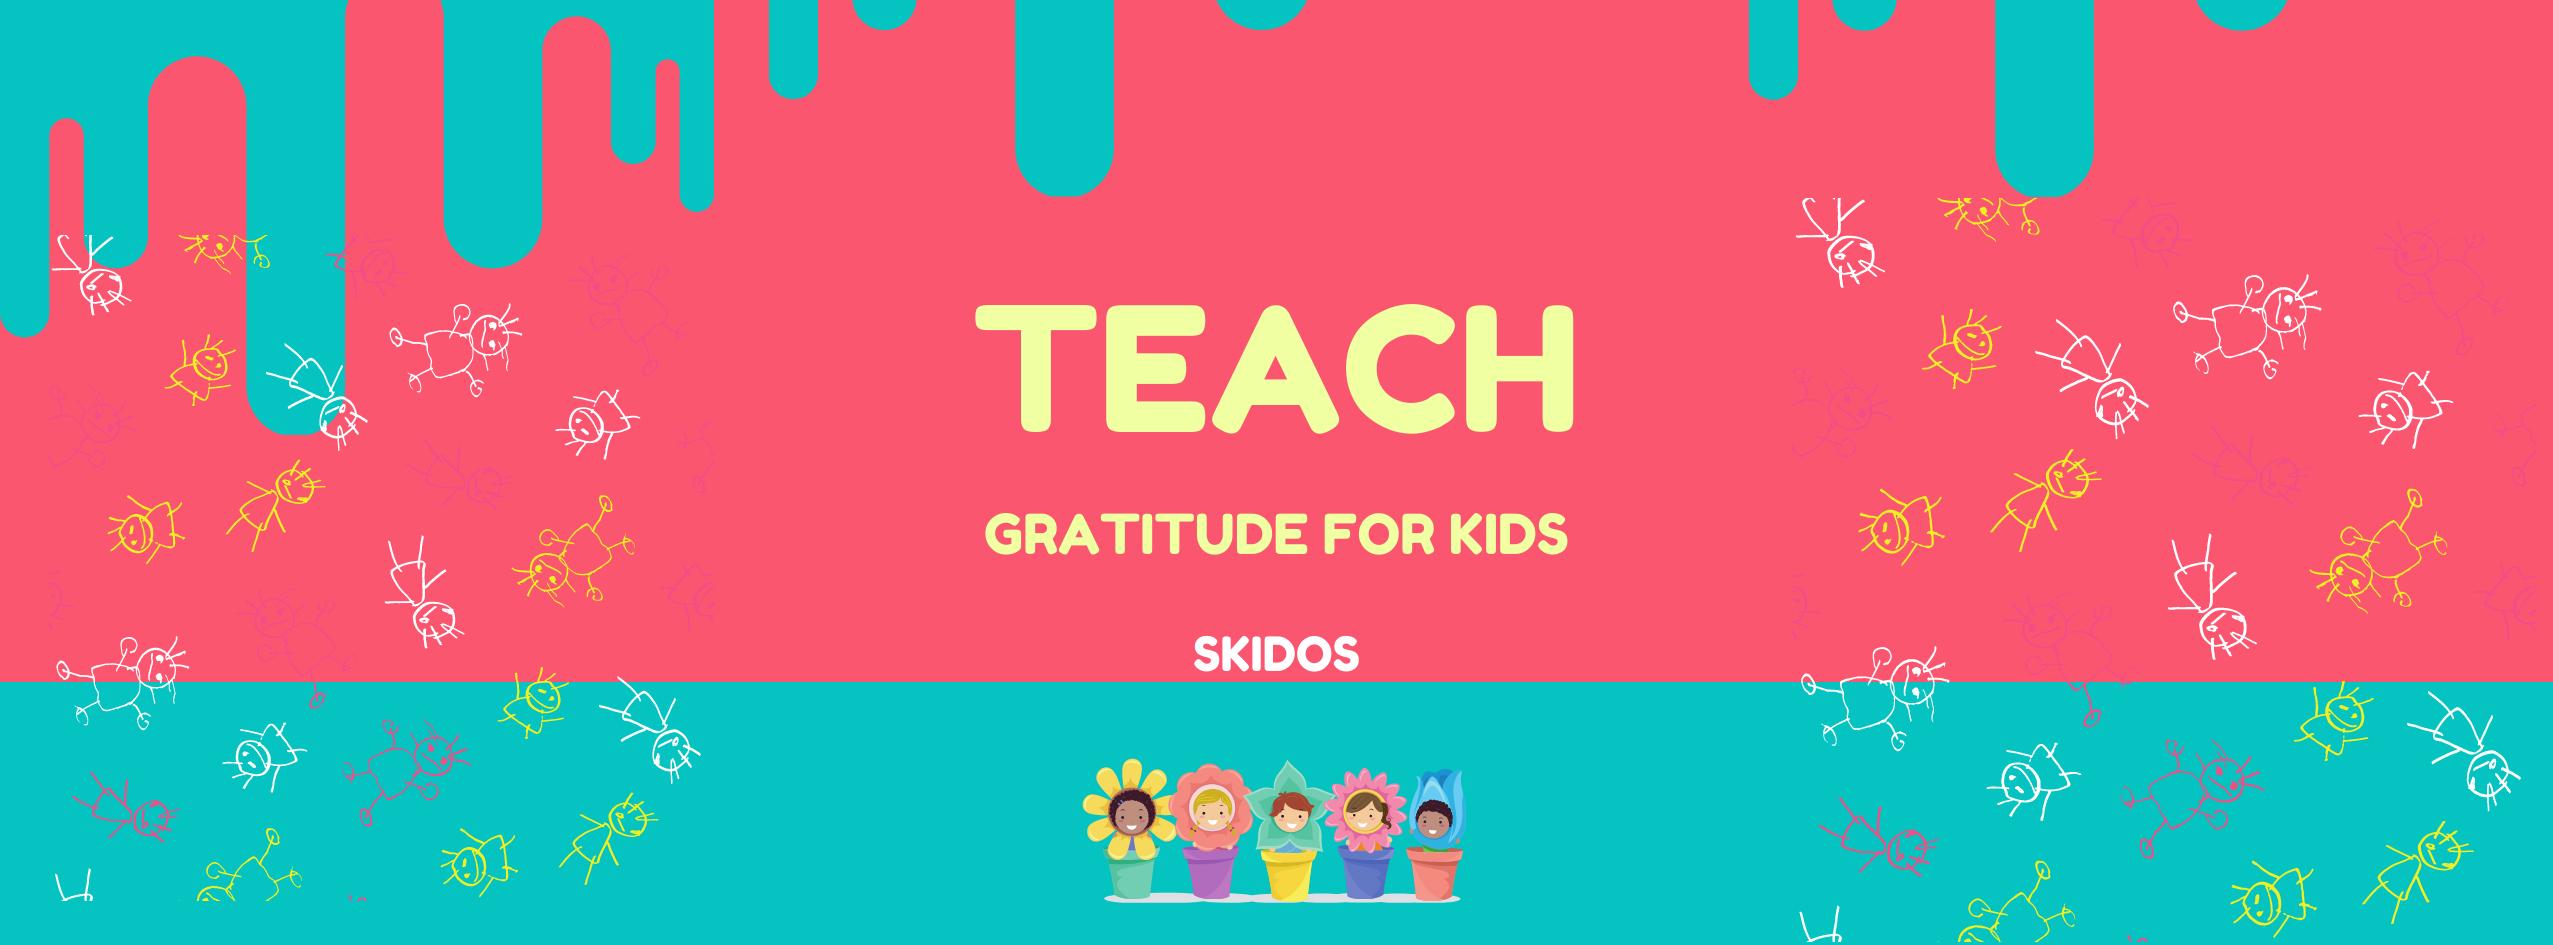 How to teach kids gratitude: Activities, Tips [Expert Advice]